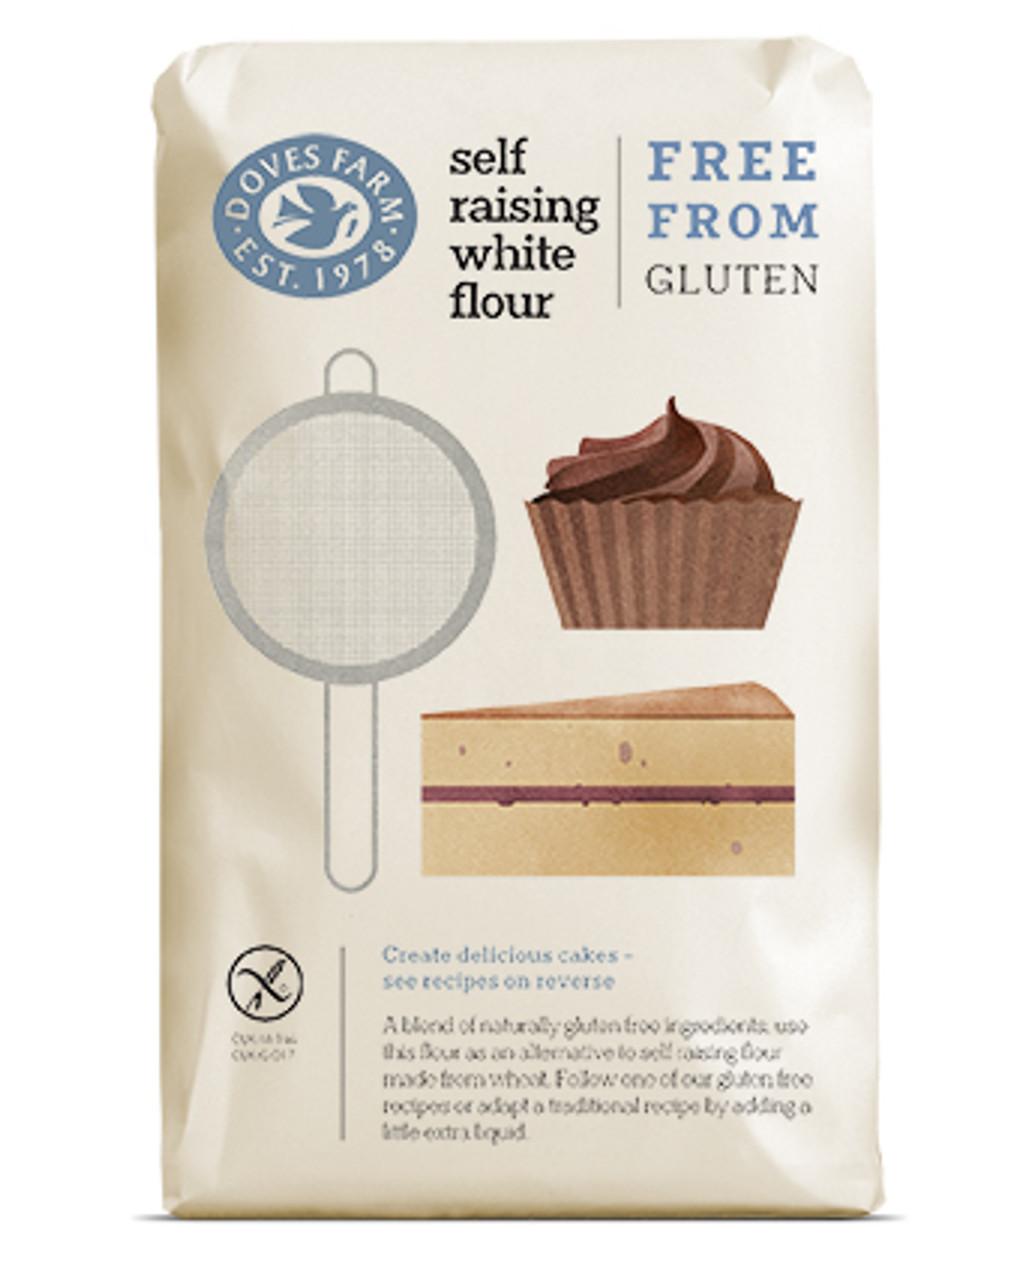 Doves Farm Gluten Free Self Raising White Flour 1kg